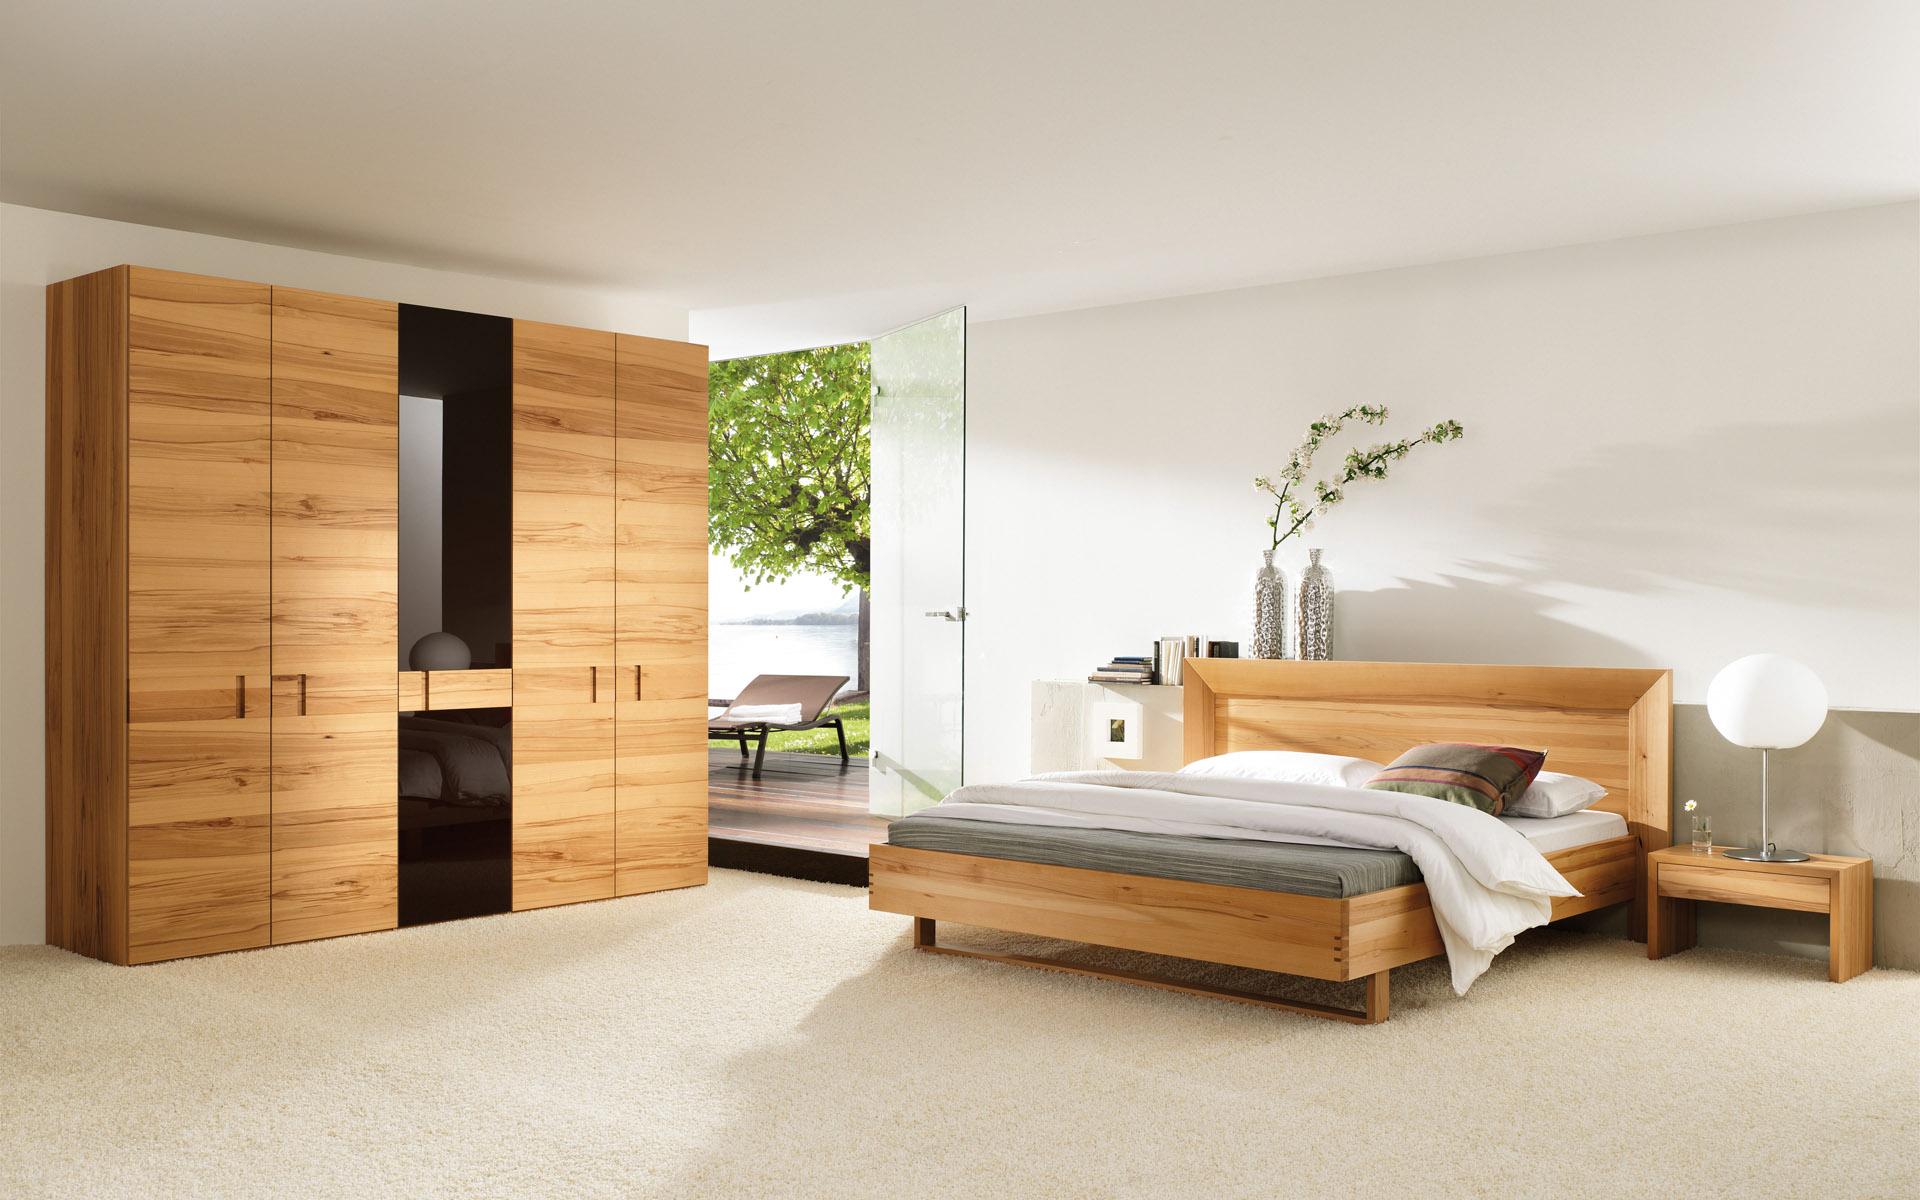 Furniture wallpaper   394217 1920x1200